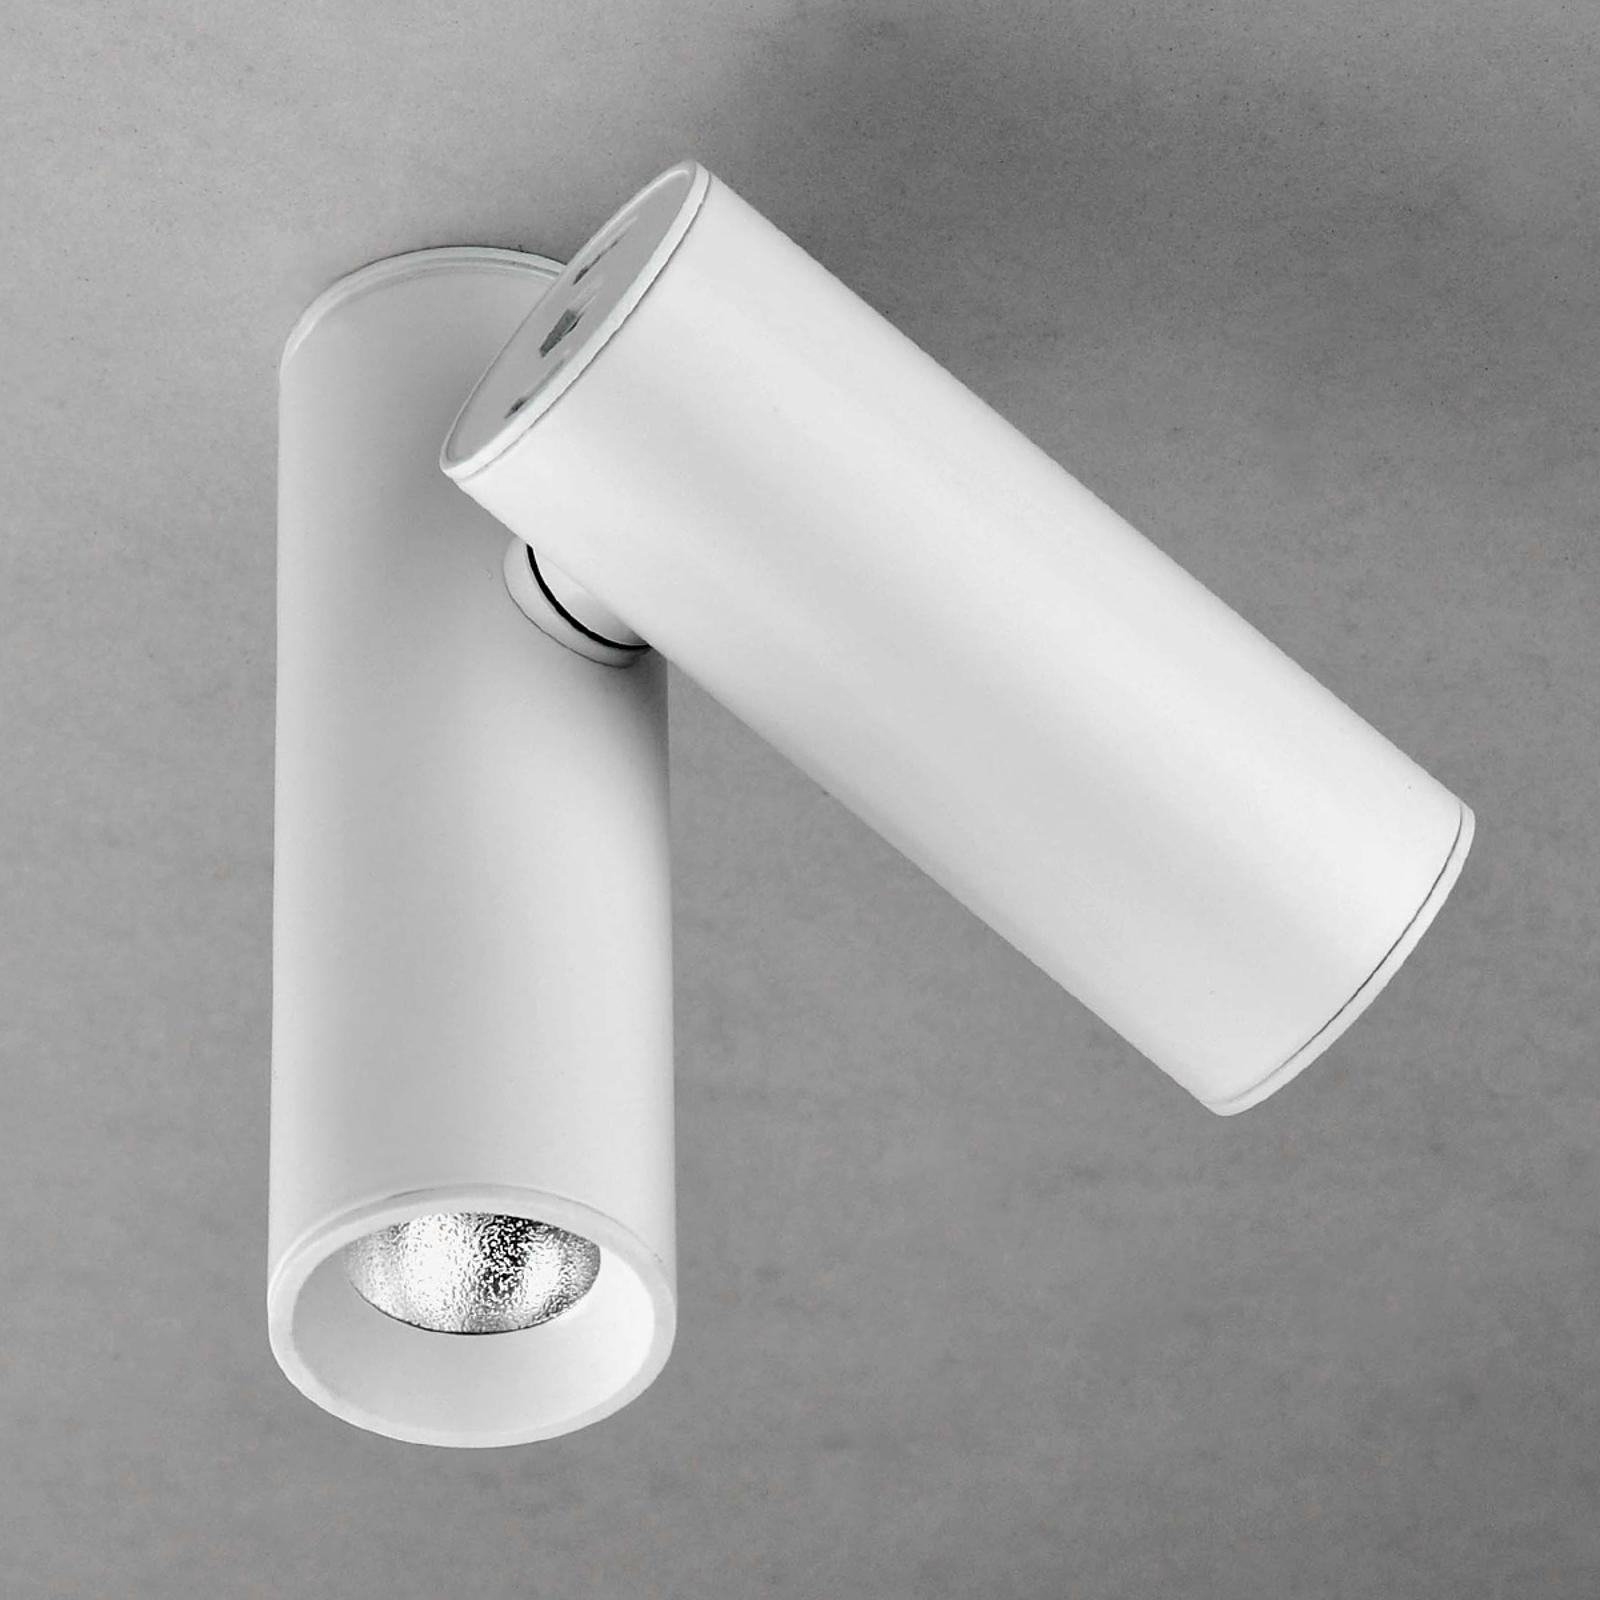 Milan Tub - plafonnier LED à 2 lampes, blanc